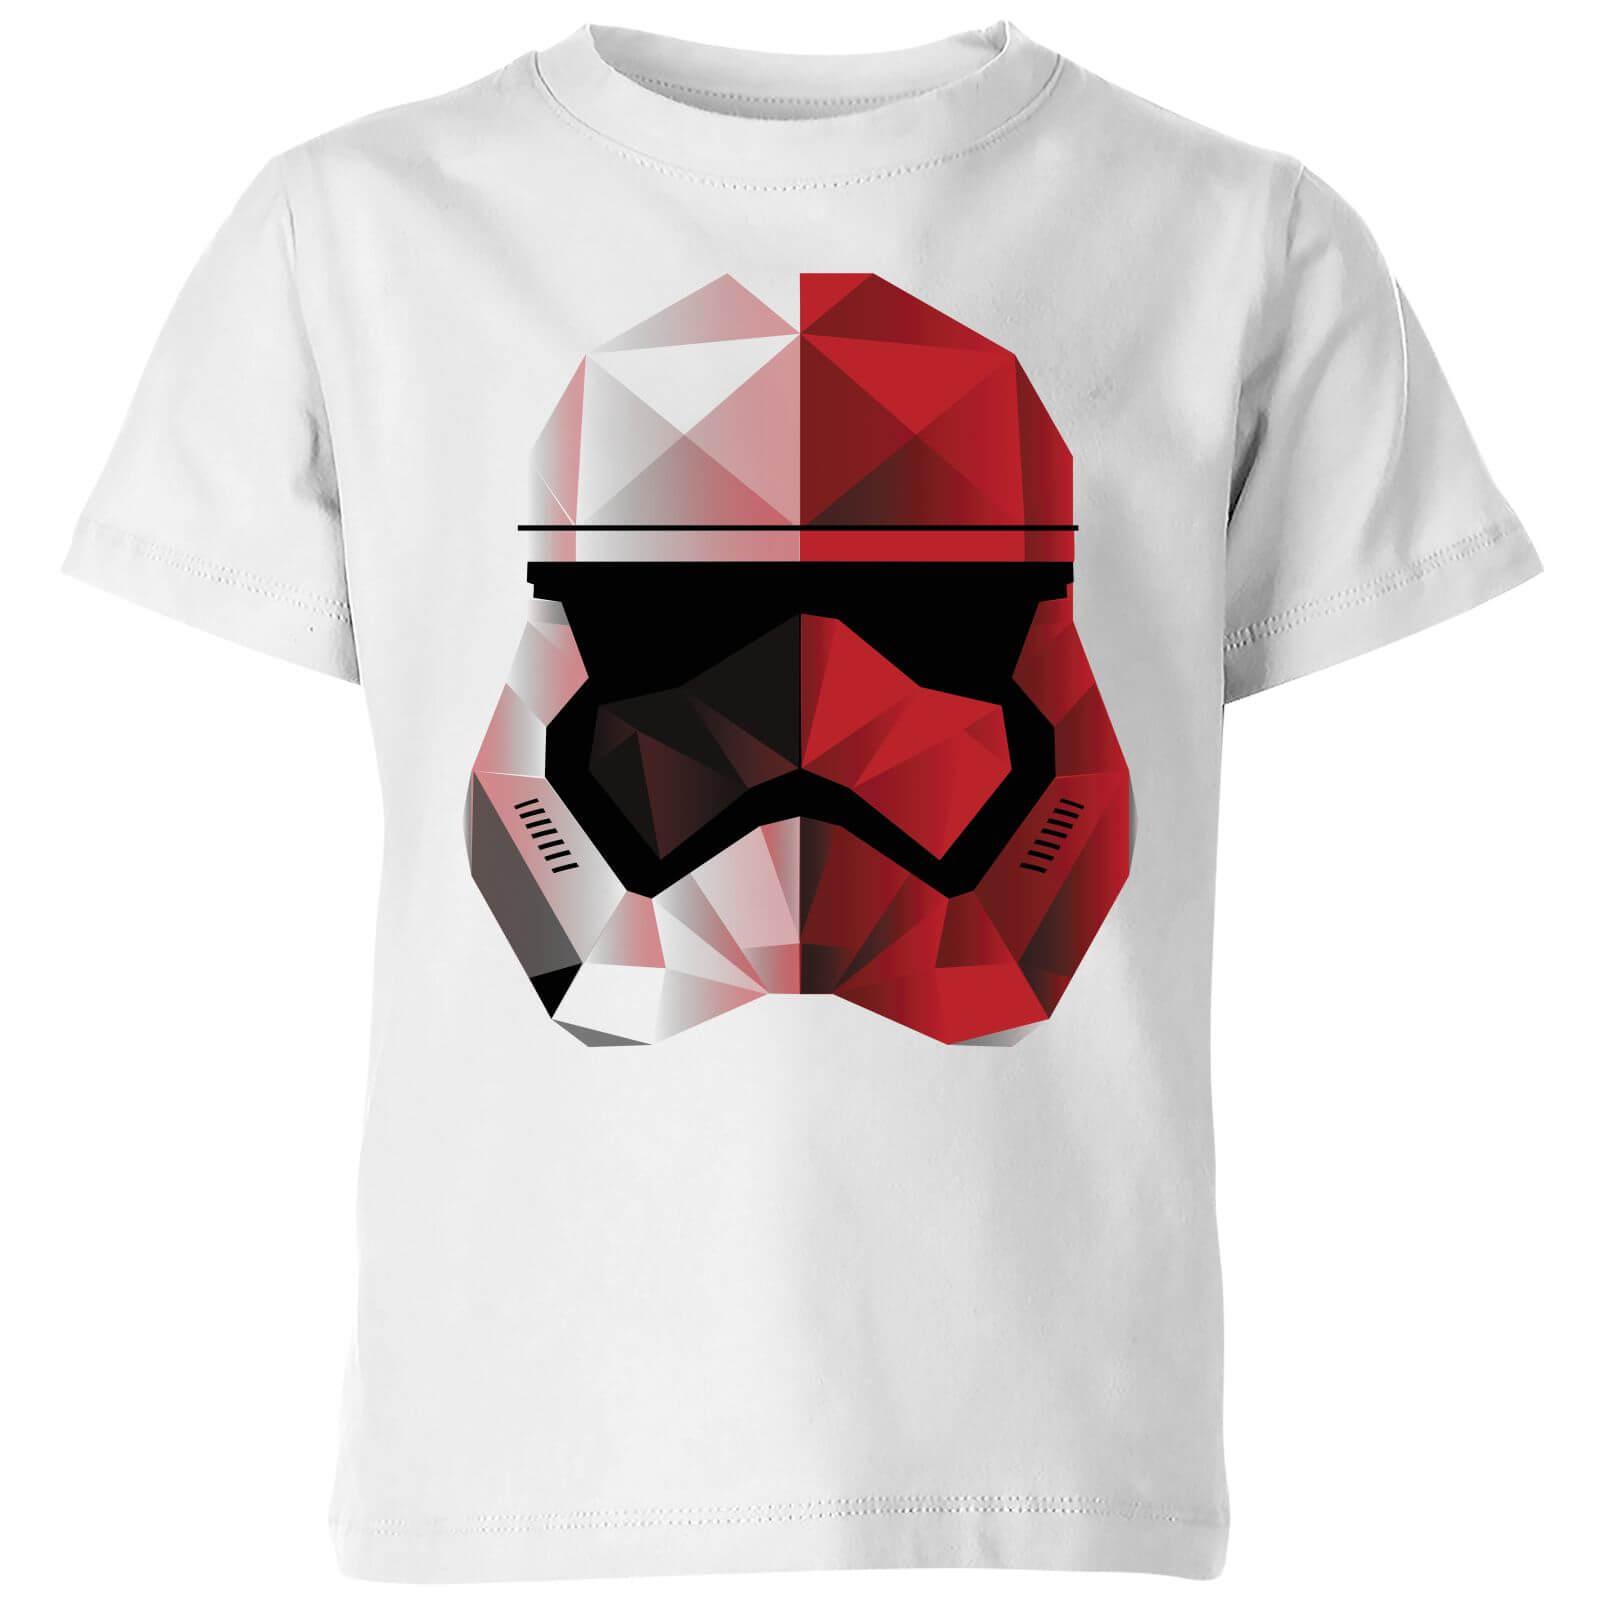 Star Wars T-Shirt Enfant Casque Stormtrooper Effet Cubiste - Star Wars - Blanc - 7-8 ans - Blanc